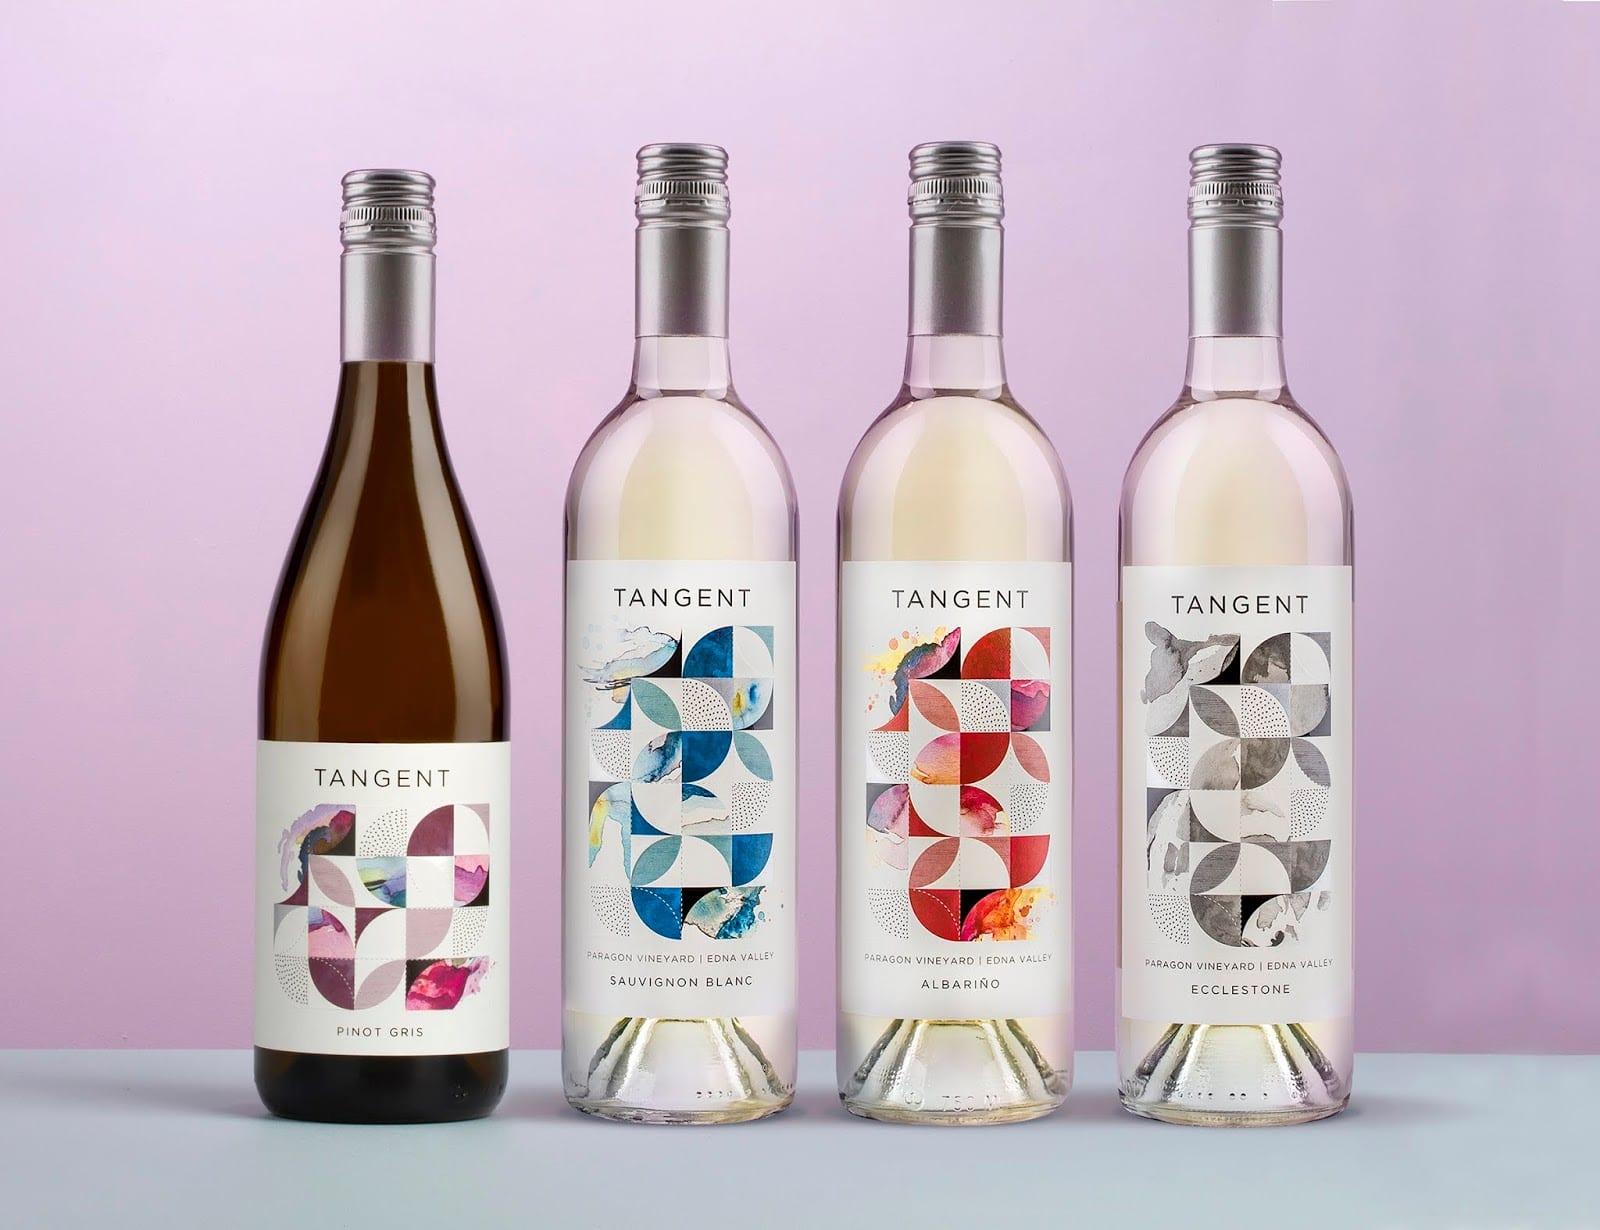 TANGENT img 1 - Redesign obalu Tangent Wines, populárních vín z Kalifornie